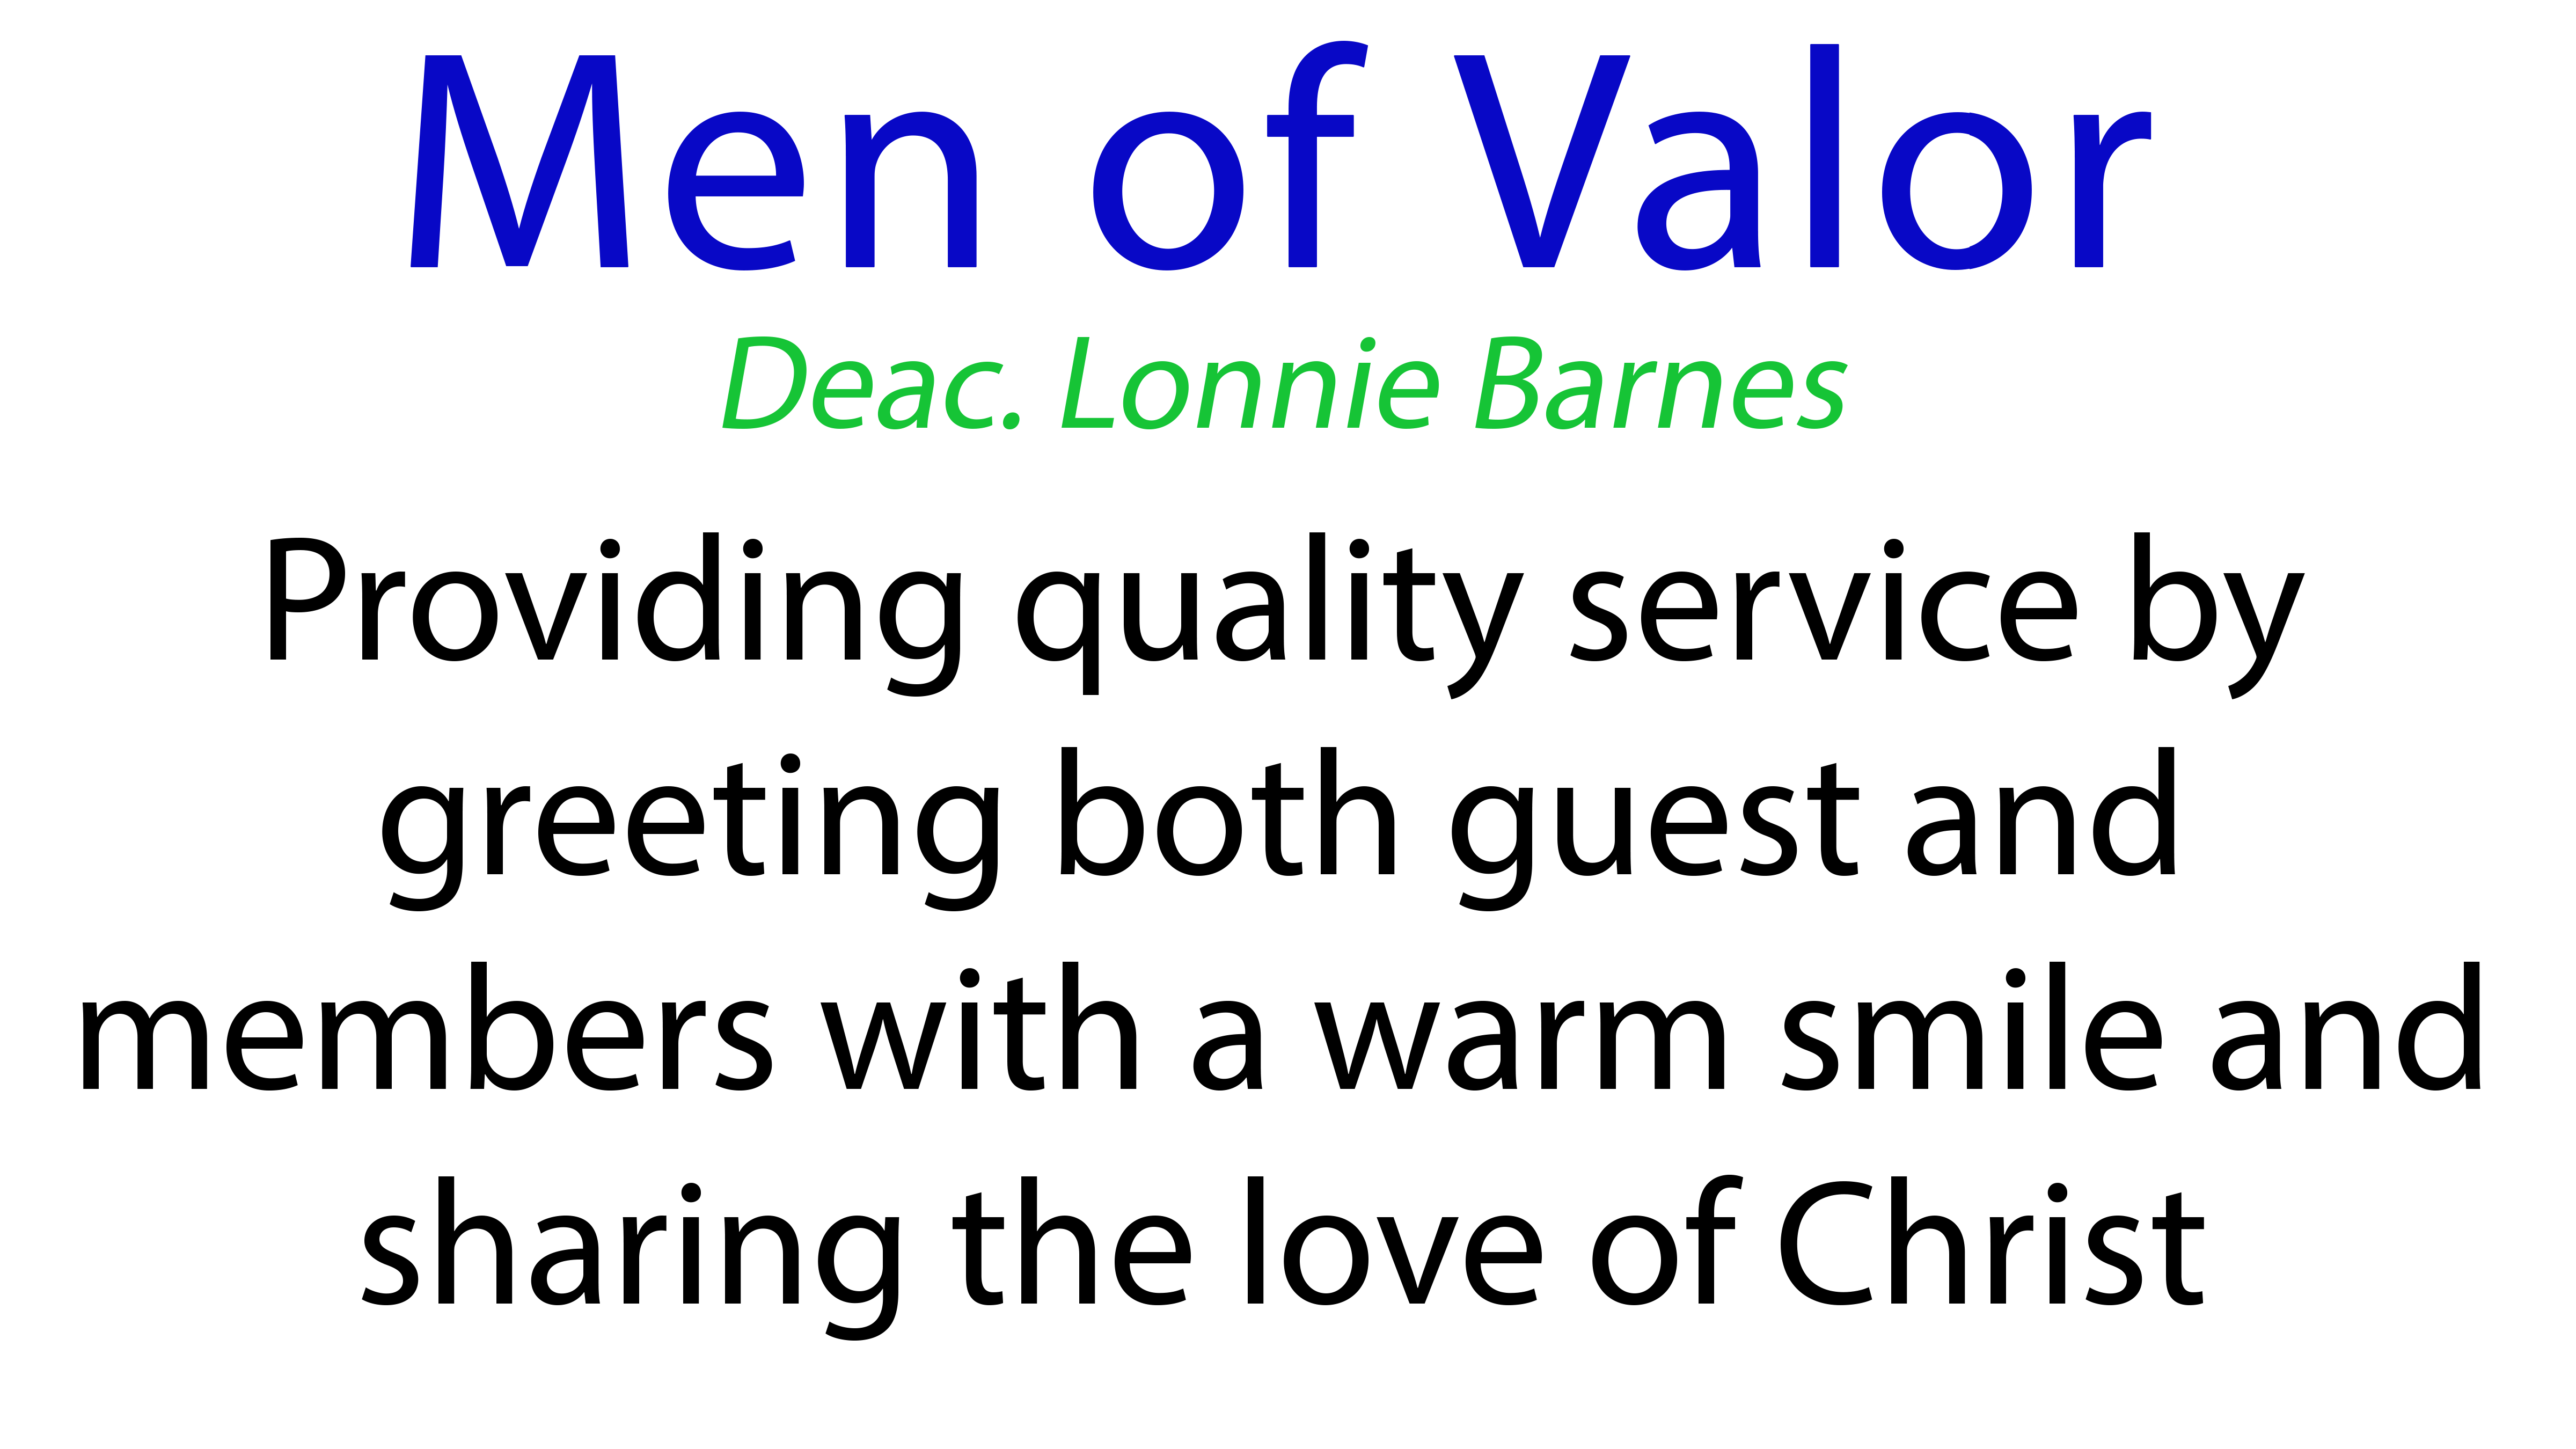 Men of Valor Ministry